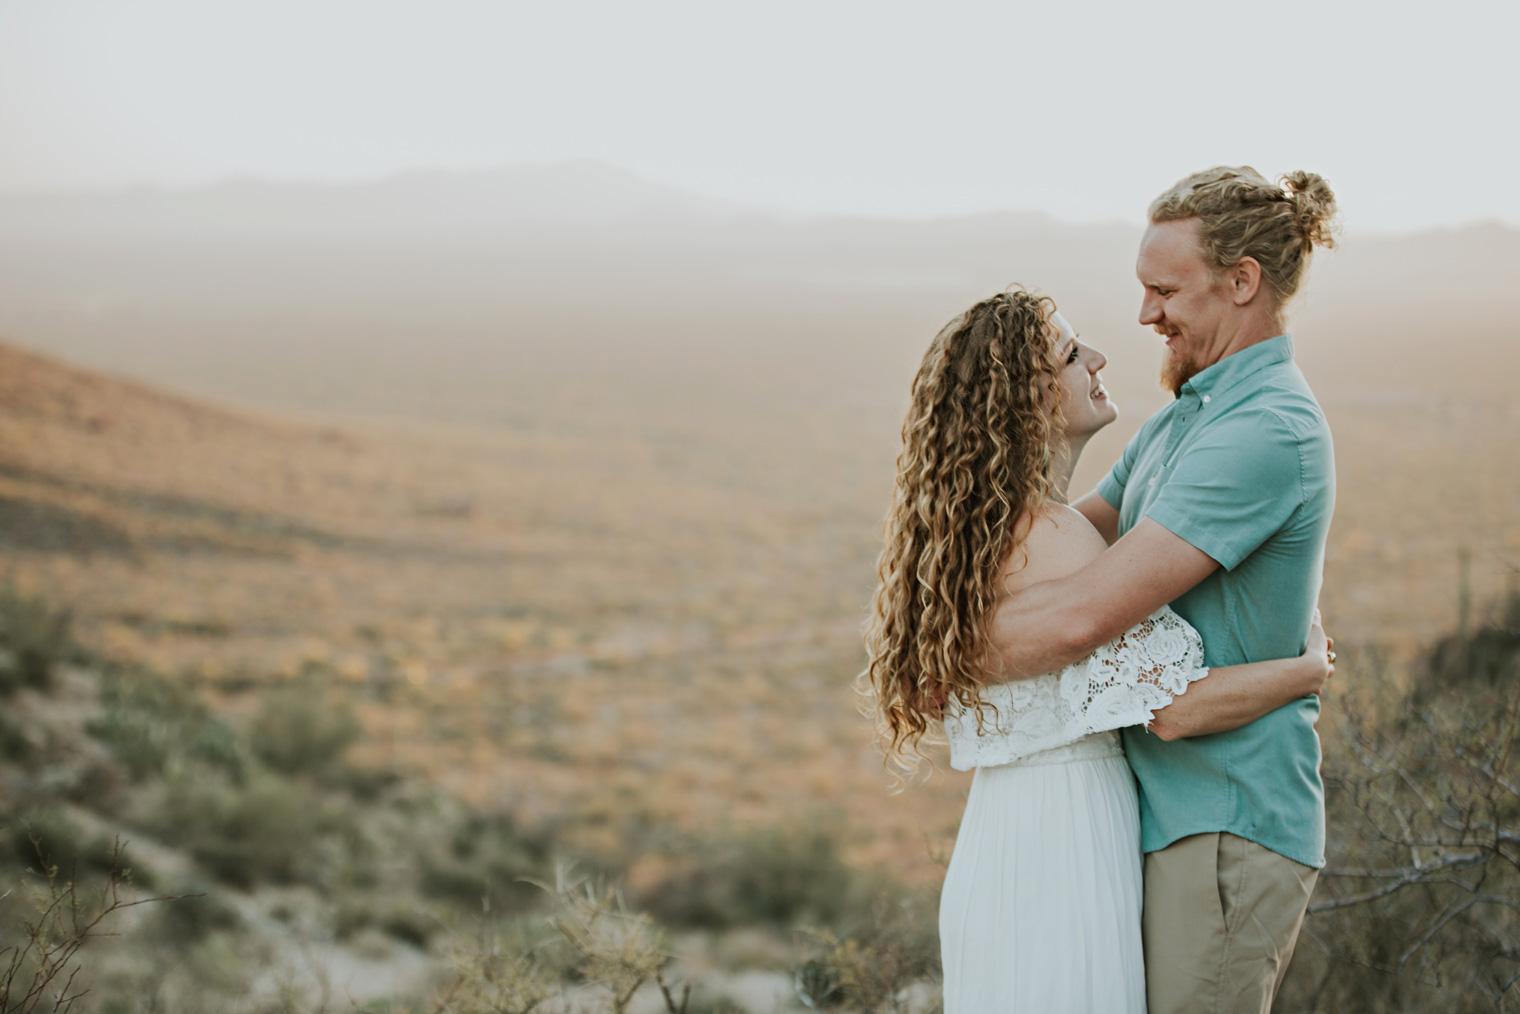 CindyGiovagnoli_Tucson_Arizona_engagement_lifestyle_portrait_Airstream_Excella_travel_trailer_camper_Saguaro_National_Park-044.jpg